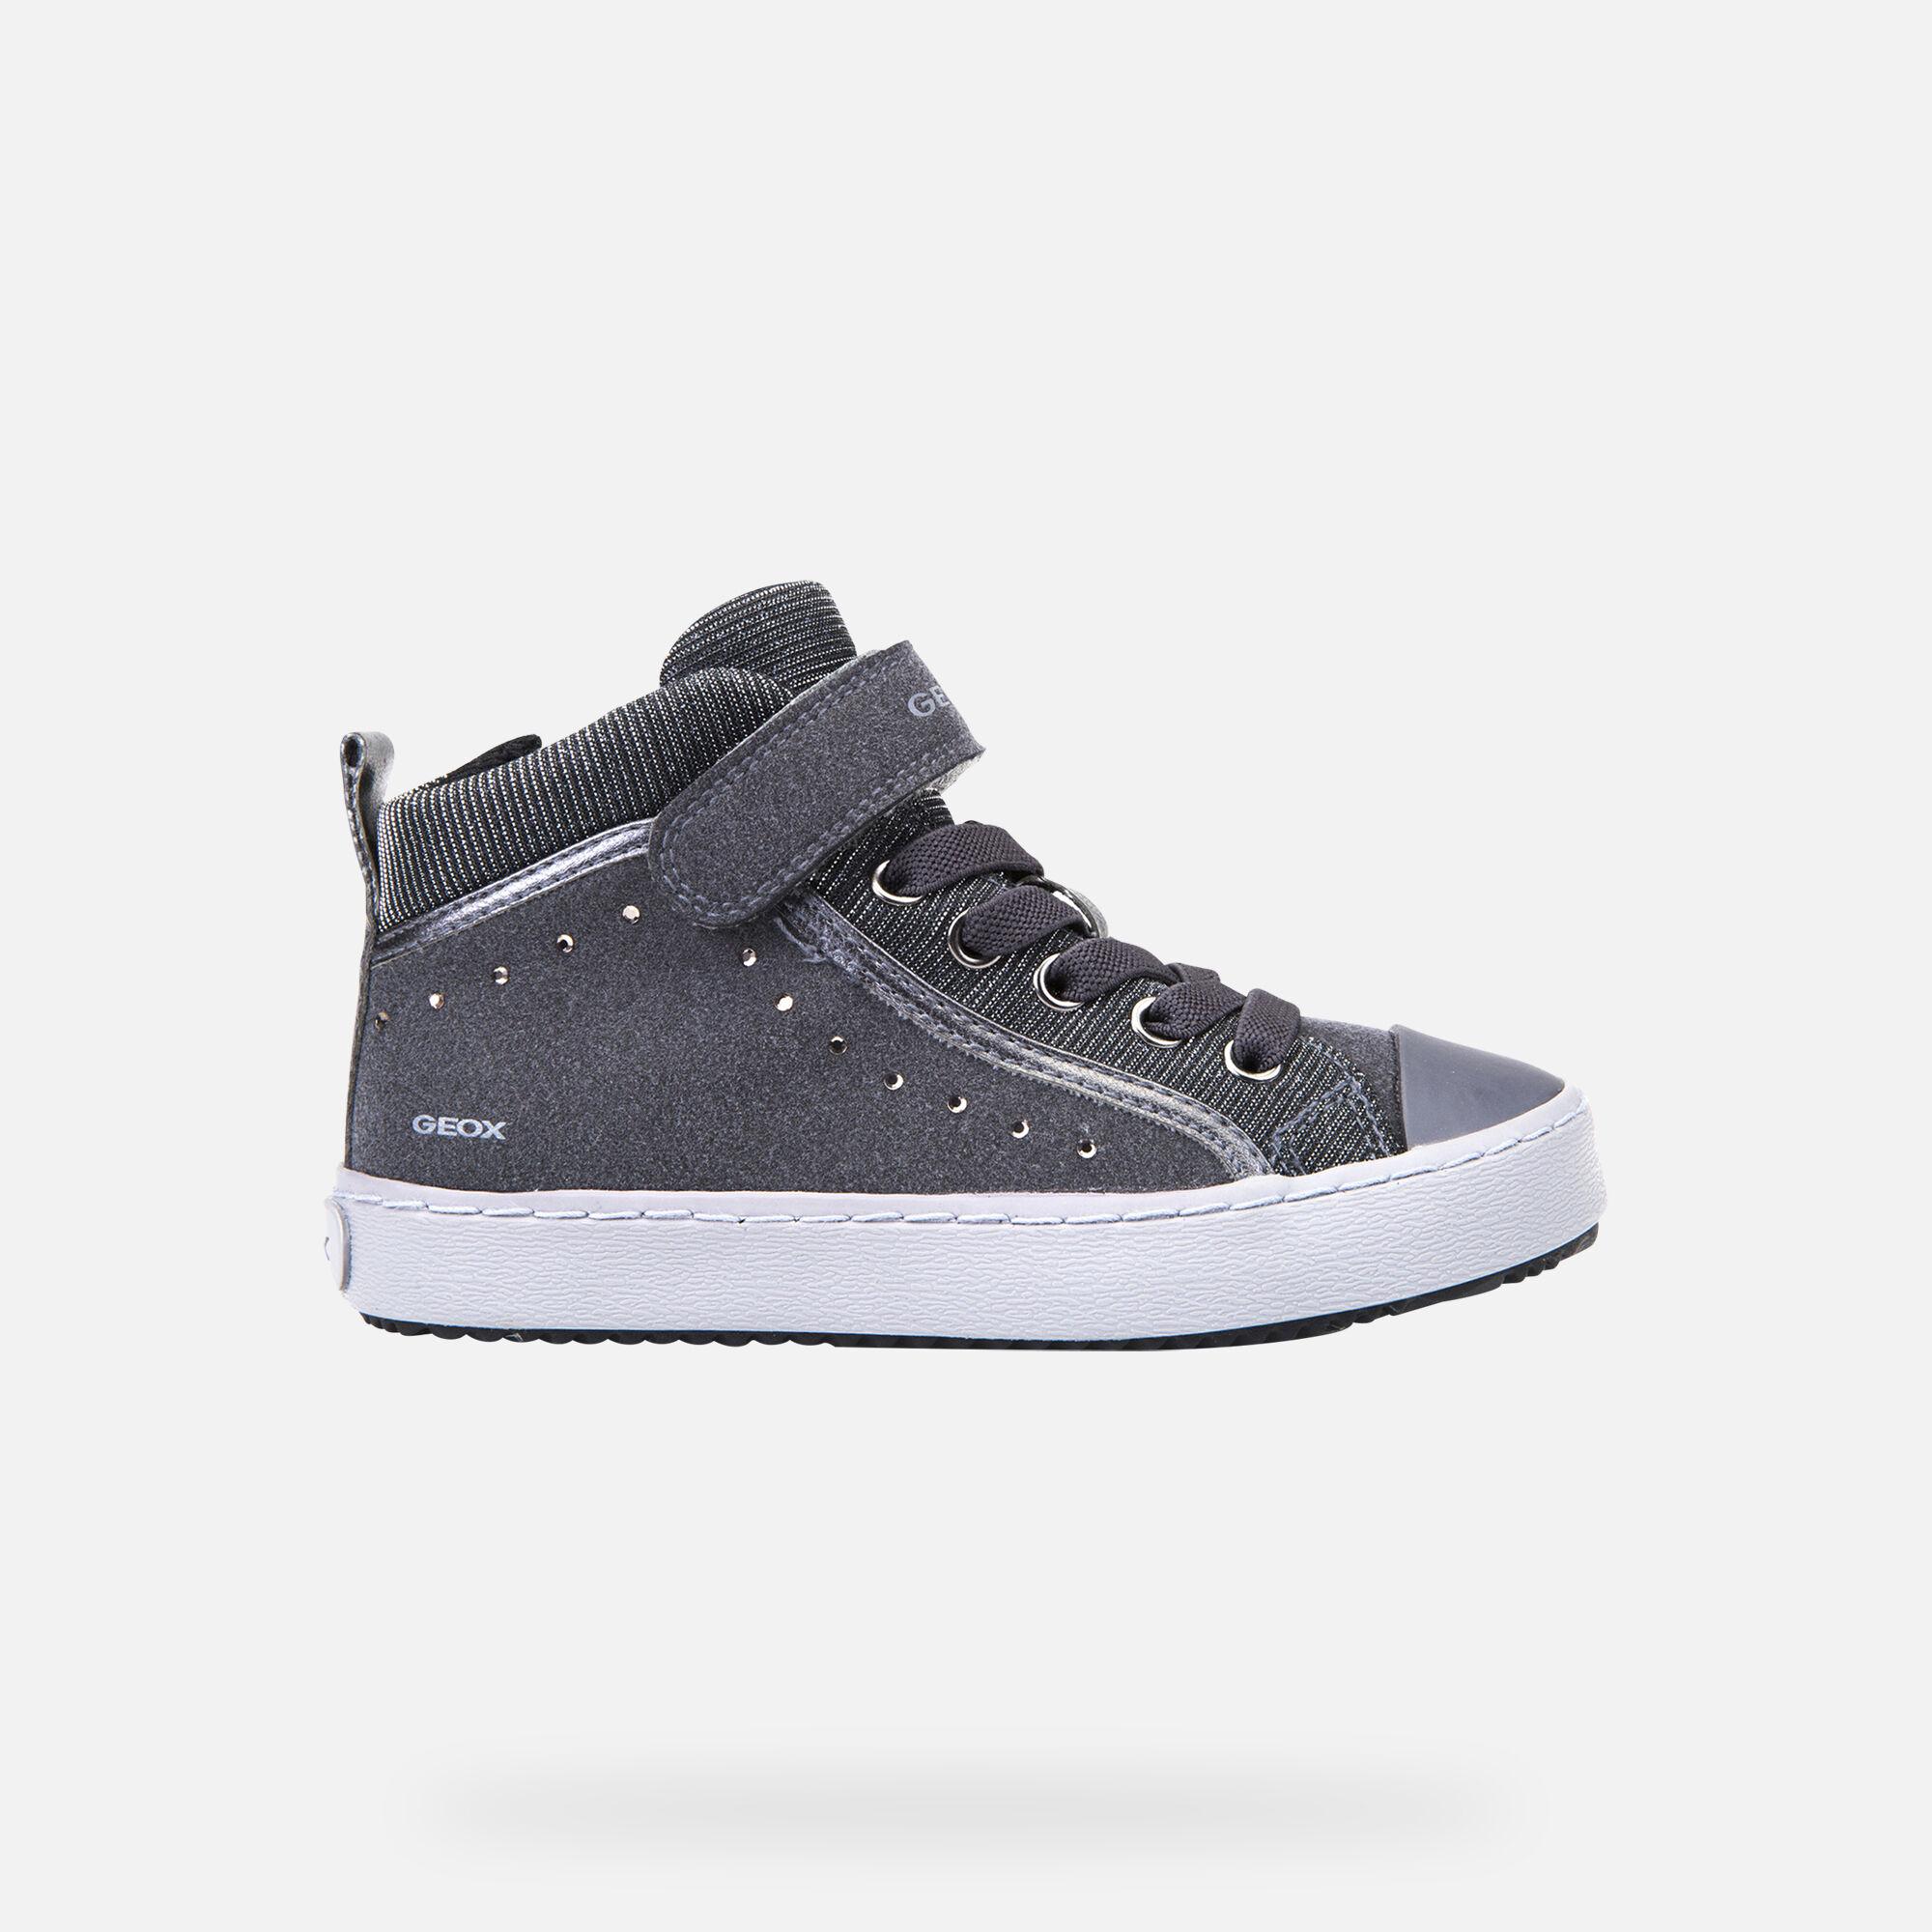 KALISPERA BIMBA Dark Grey | Sneakers Geox Bambina | FIOG